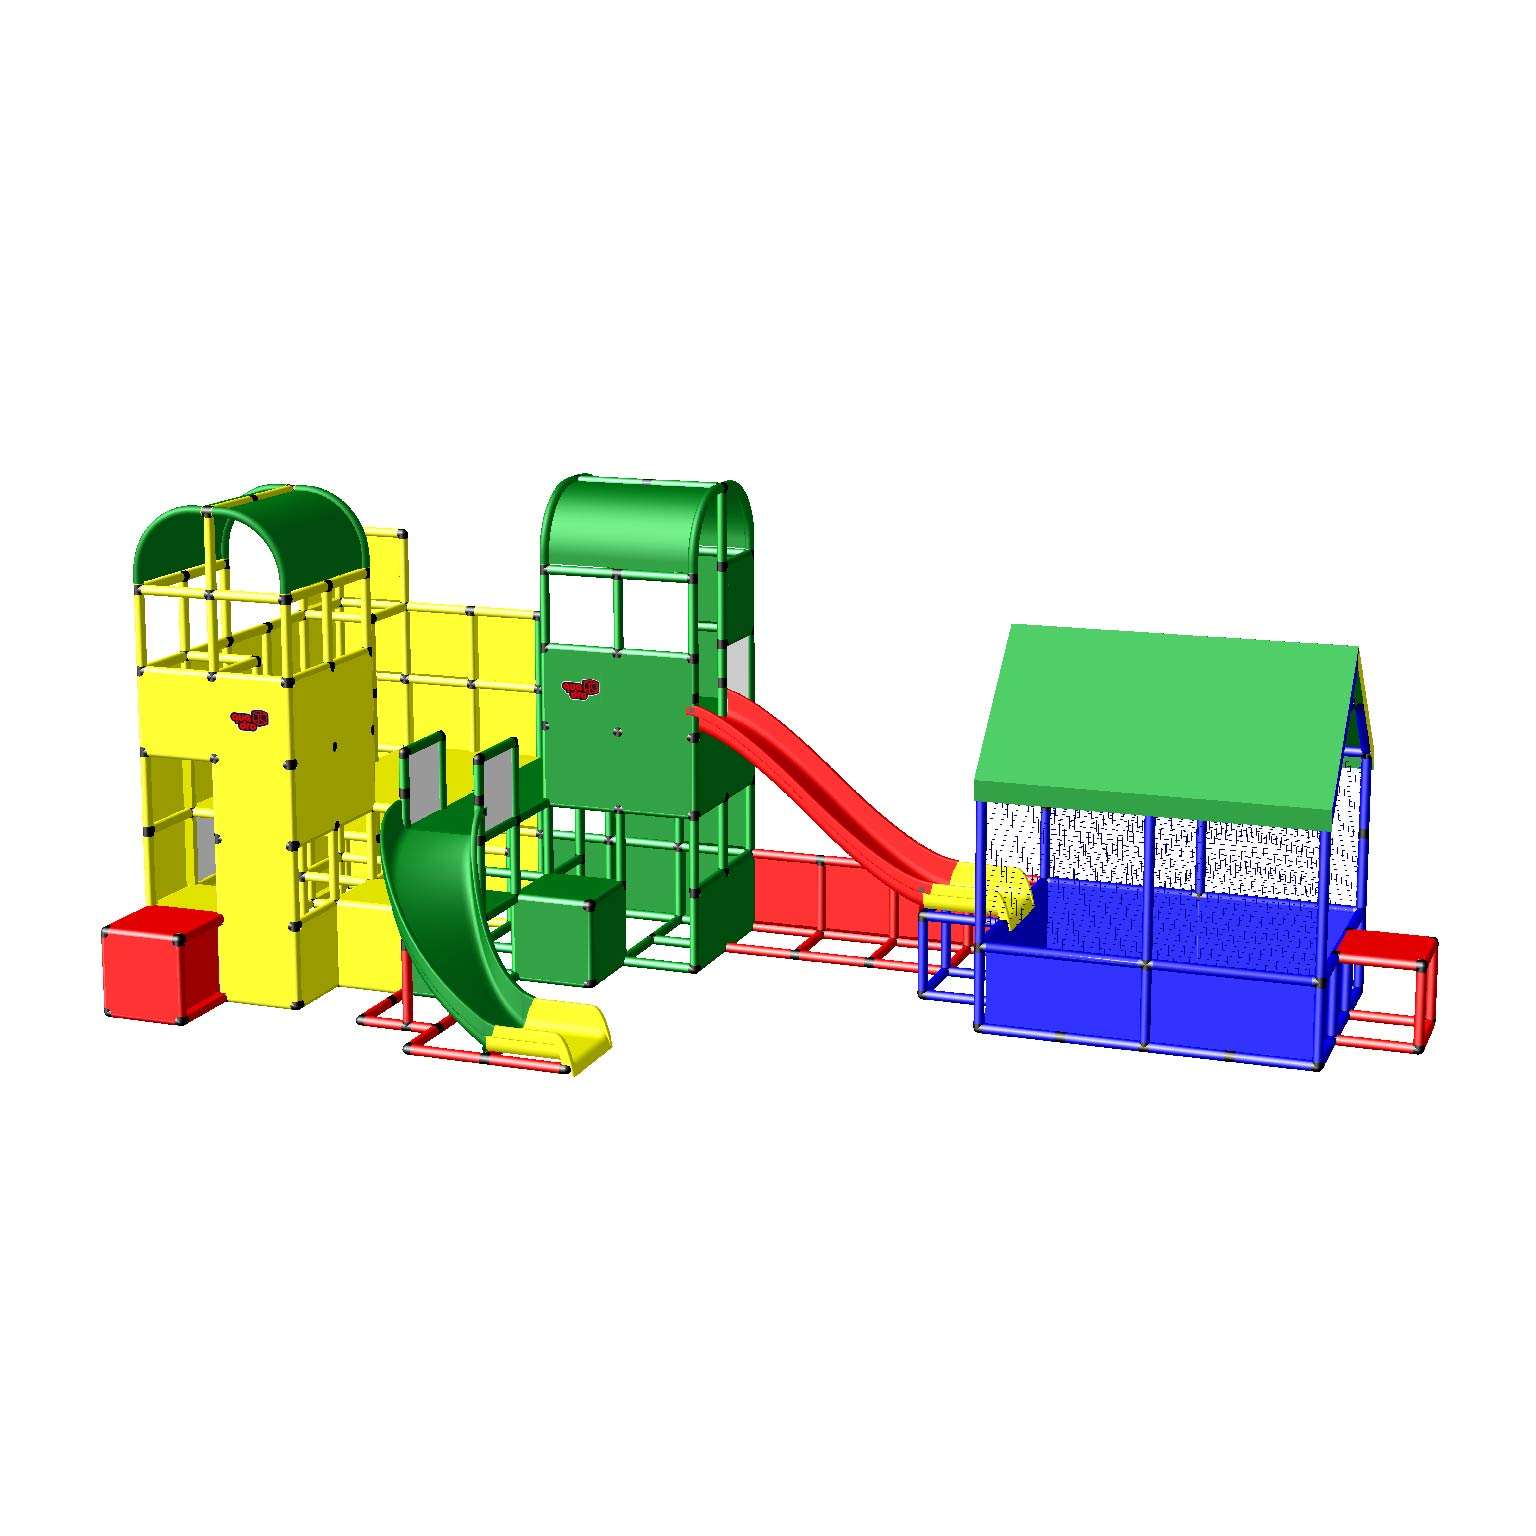 QUADROpro Mega Playcenters